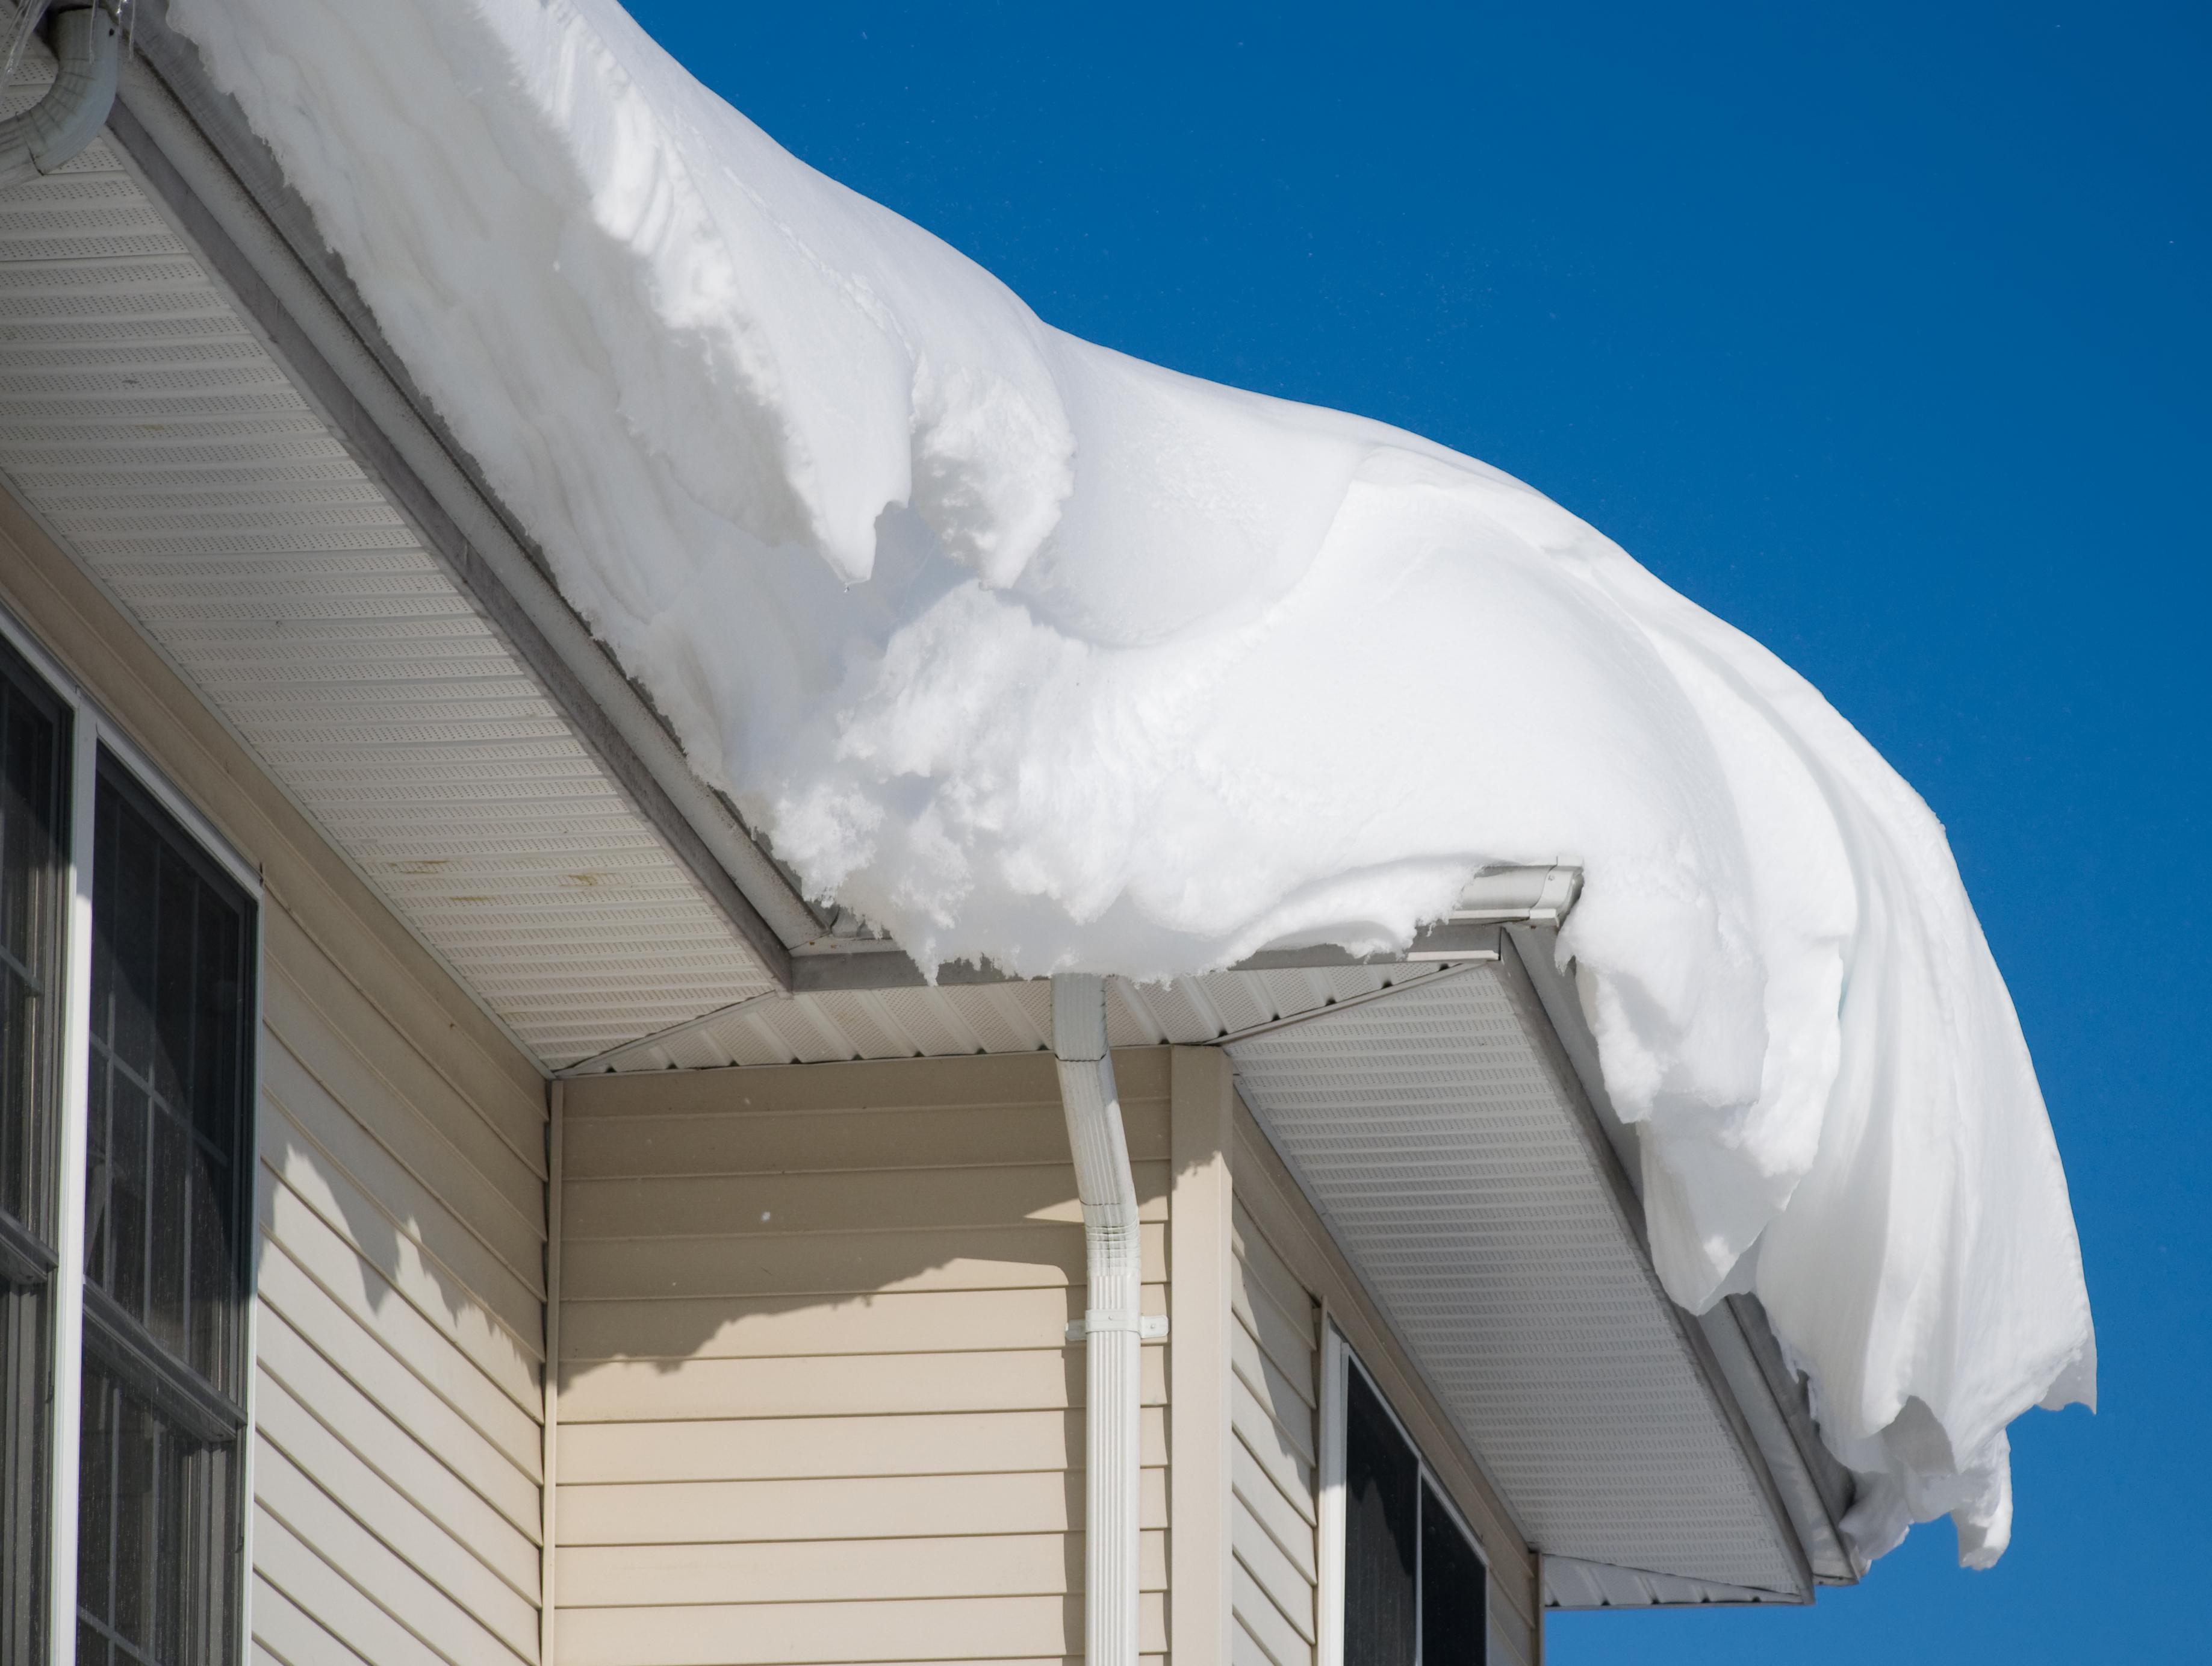 снег на крыше дома картинки добиться